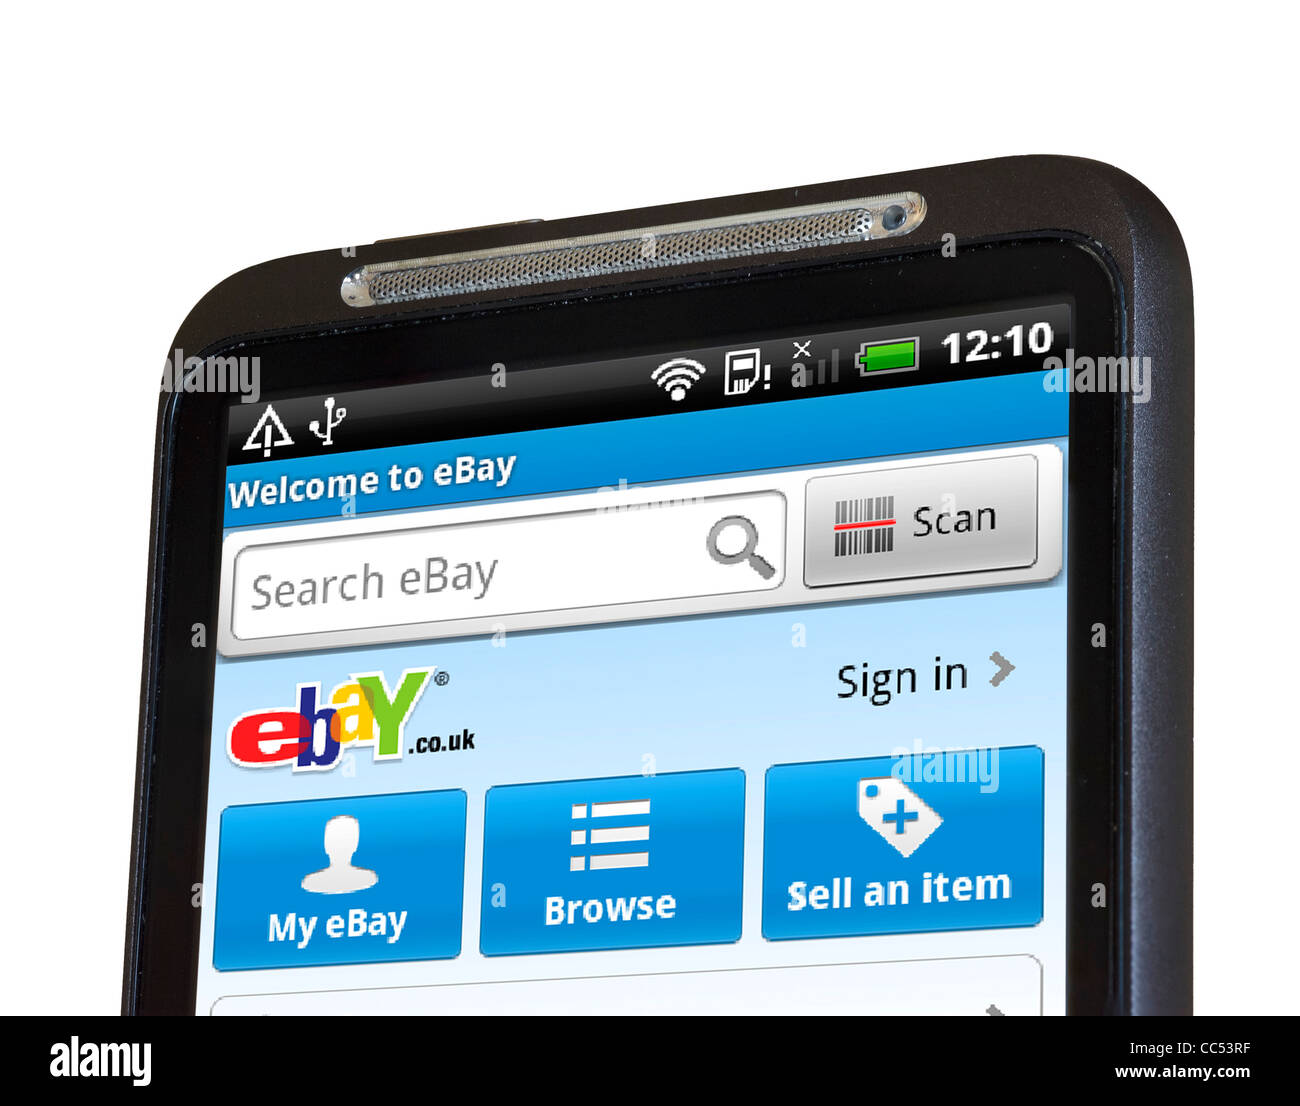 Ebay App Stock Photos & Ebay App Stock Images - Alamy